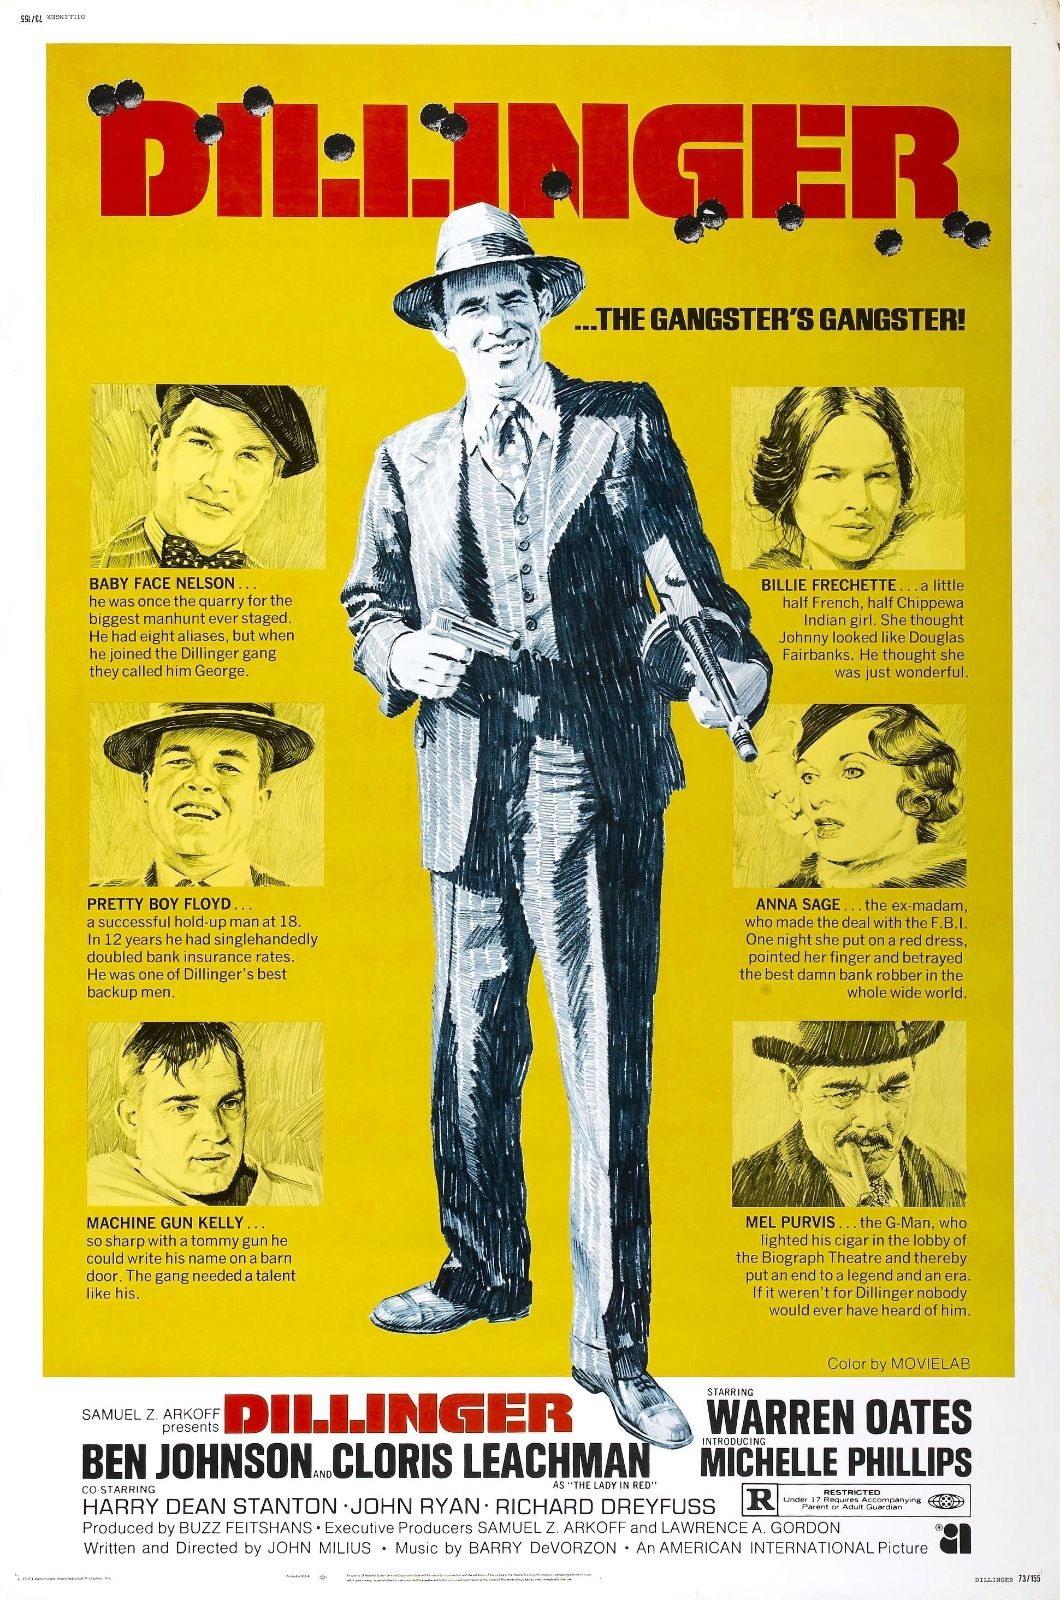 73581-Dillinger-Movie-1973-Thriller-Action-FRAMED-CANVAS-PRINT-Toile